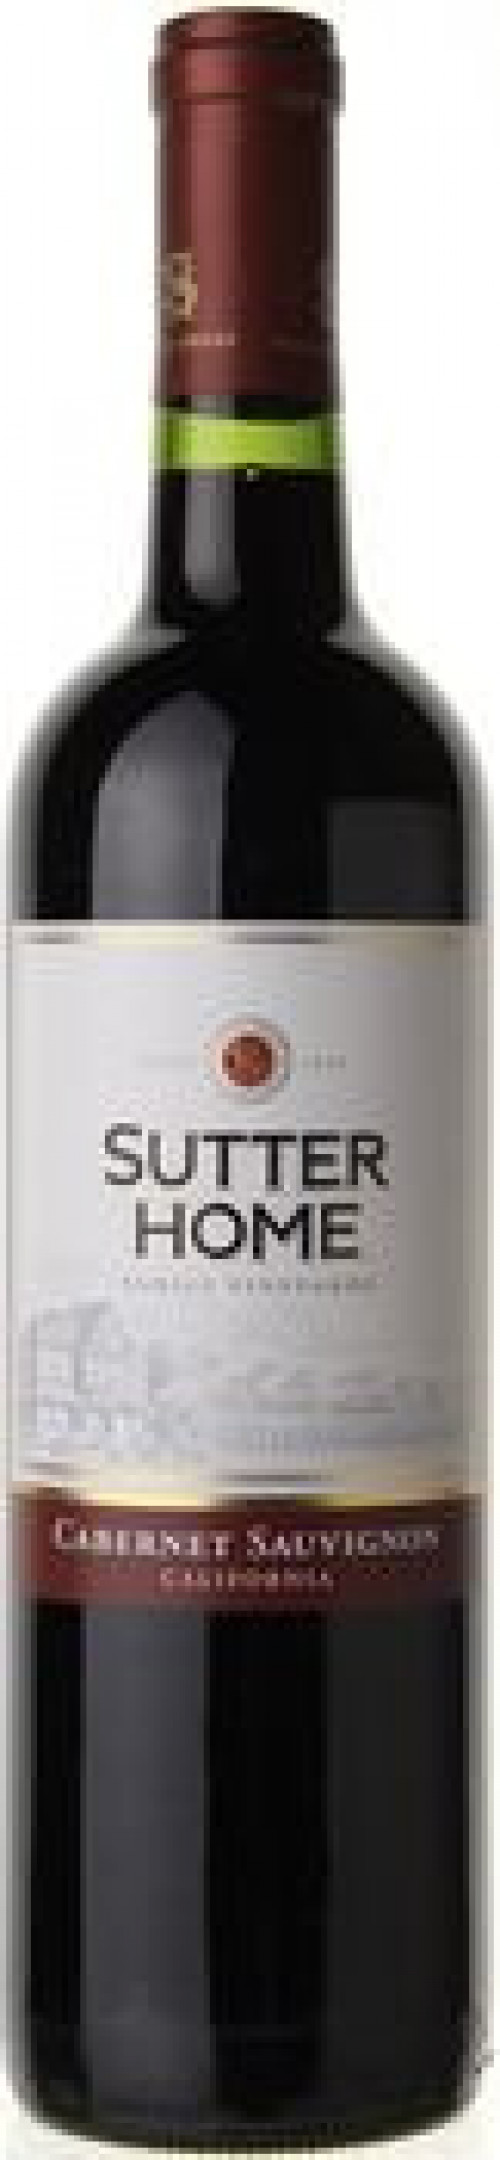 Sutter Home Cabernet Sauvignon 750ml